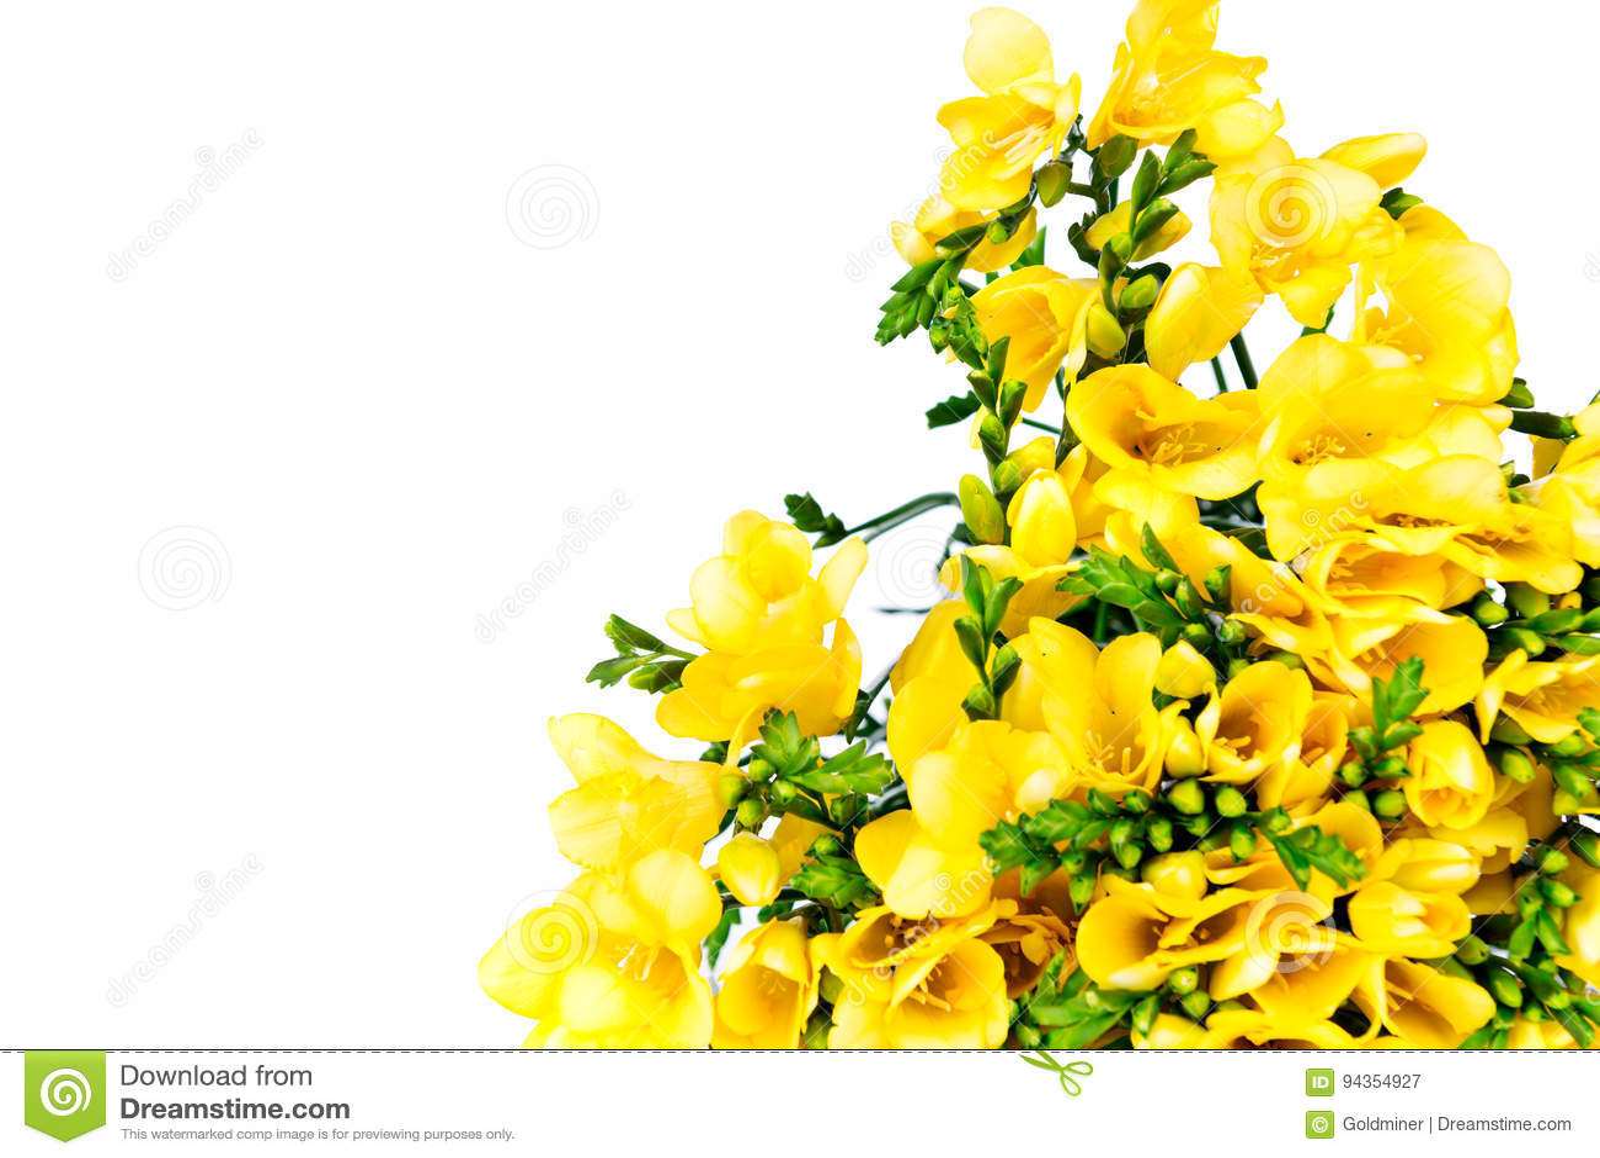 Yellow Freesia Flowers On White Background Stock Image Image Of